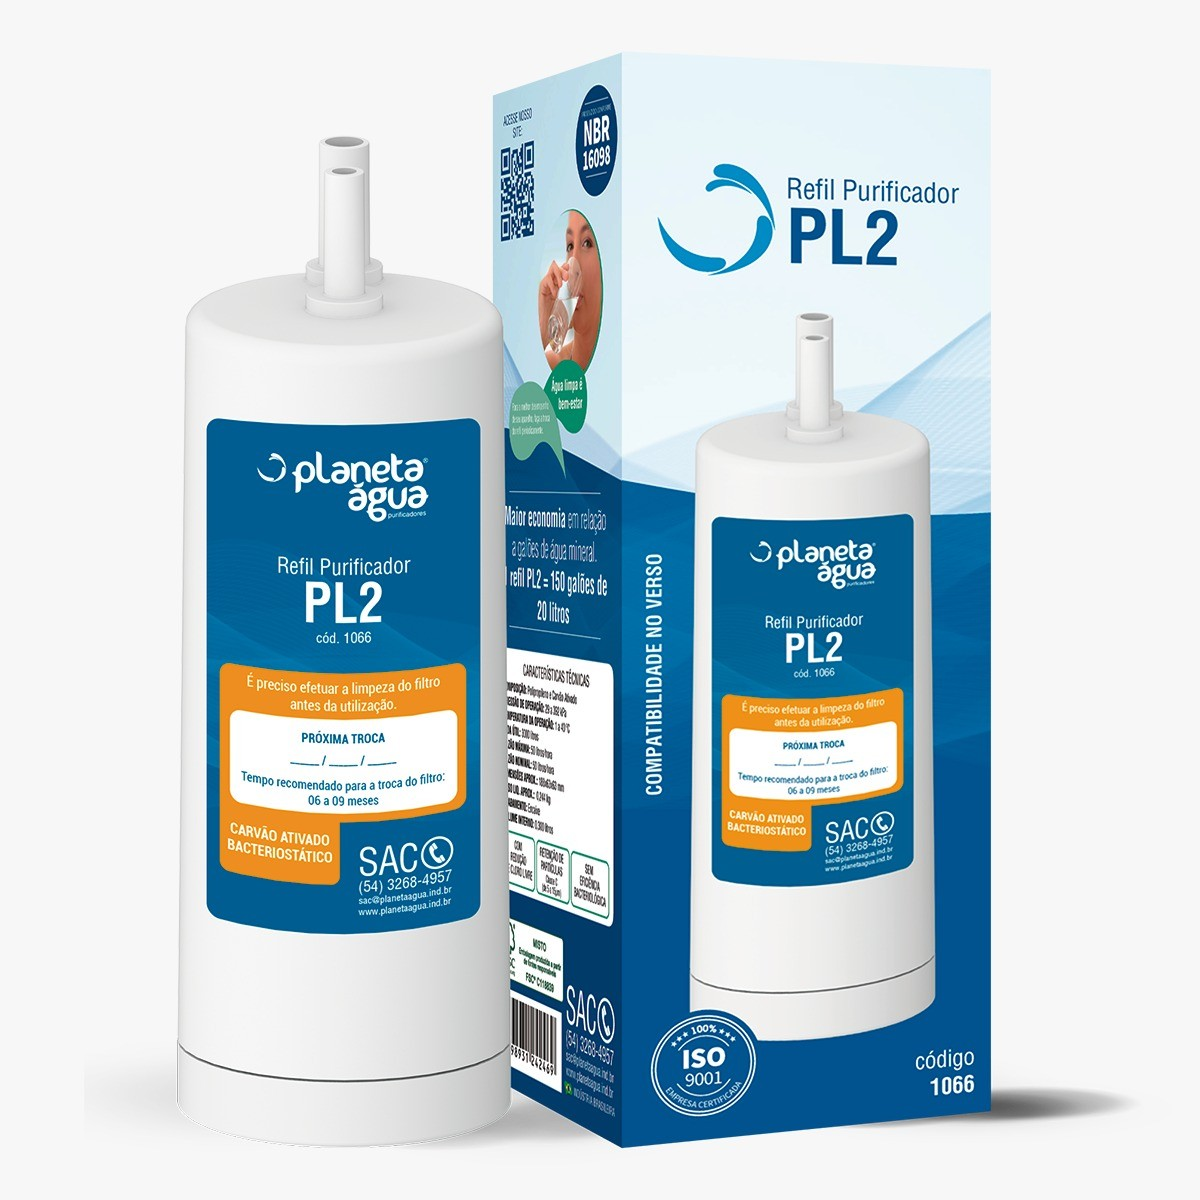 Refil  PL2 para purificadores Latina Purifive, Vitamax, PA731, PA735, PN535 - Similar